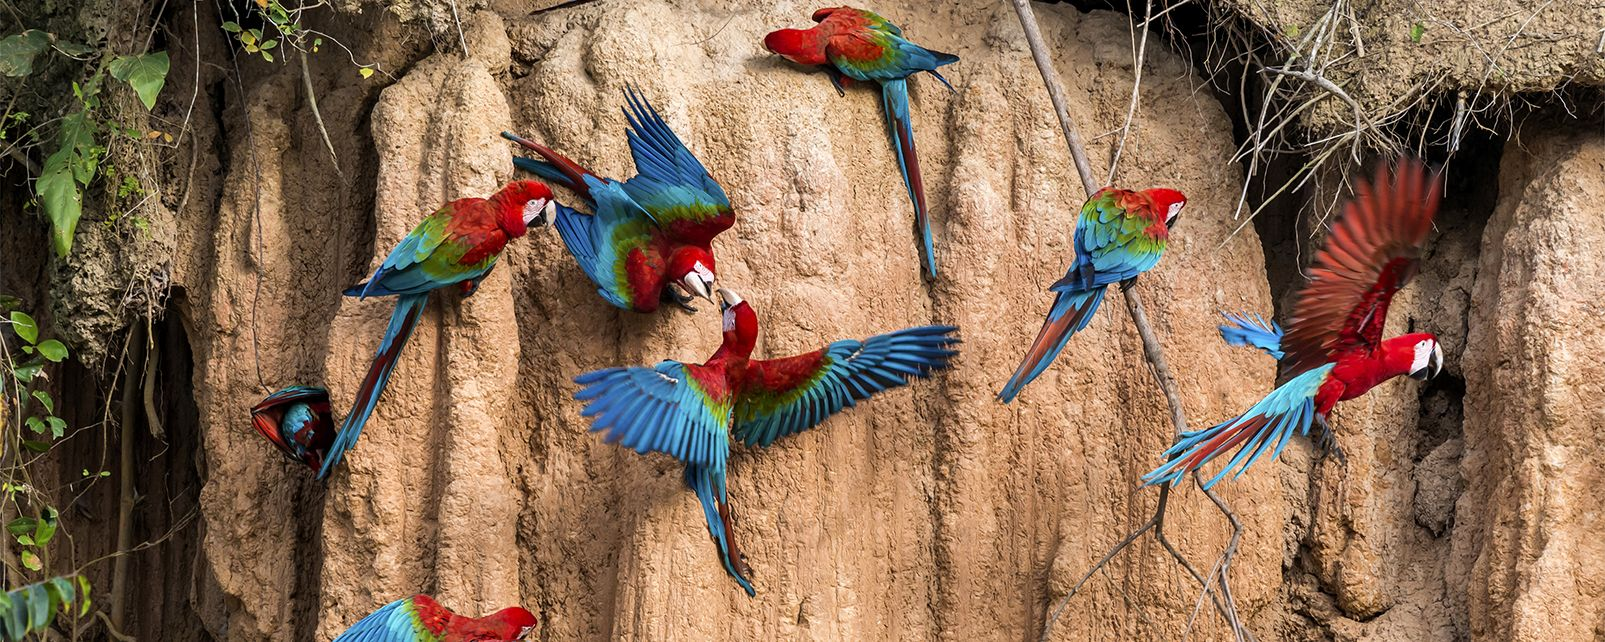 Amazonia , The Amazon Rainforest , Brazil